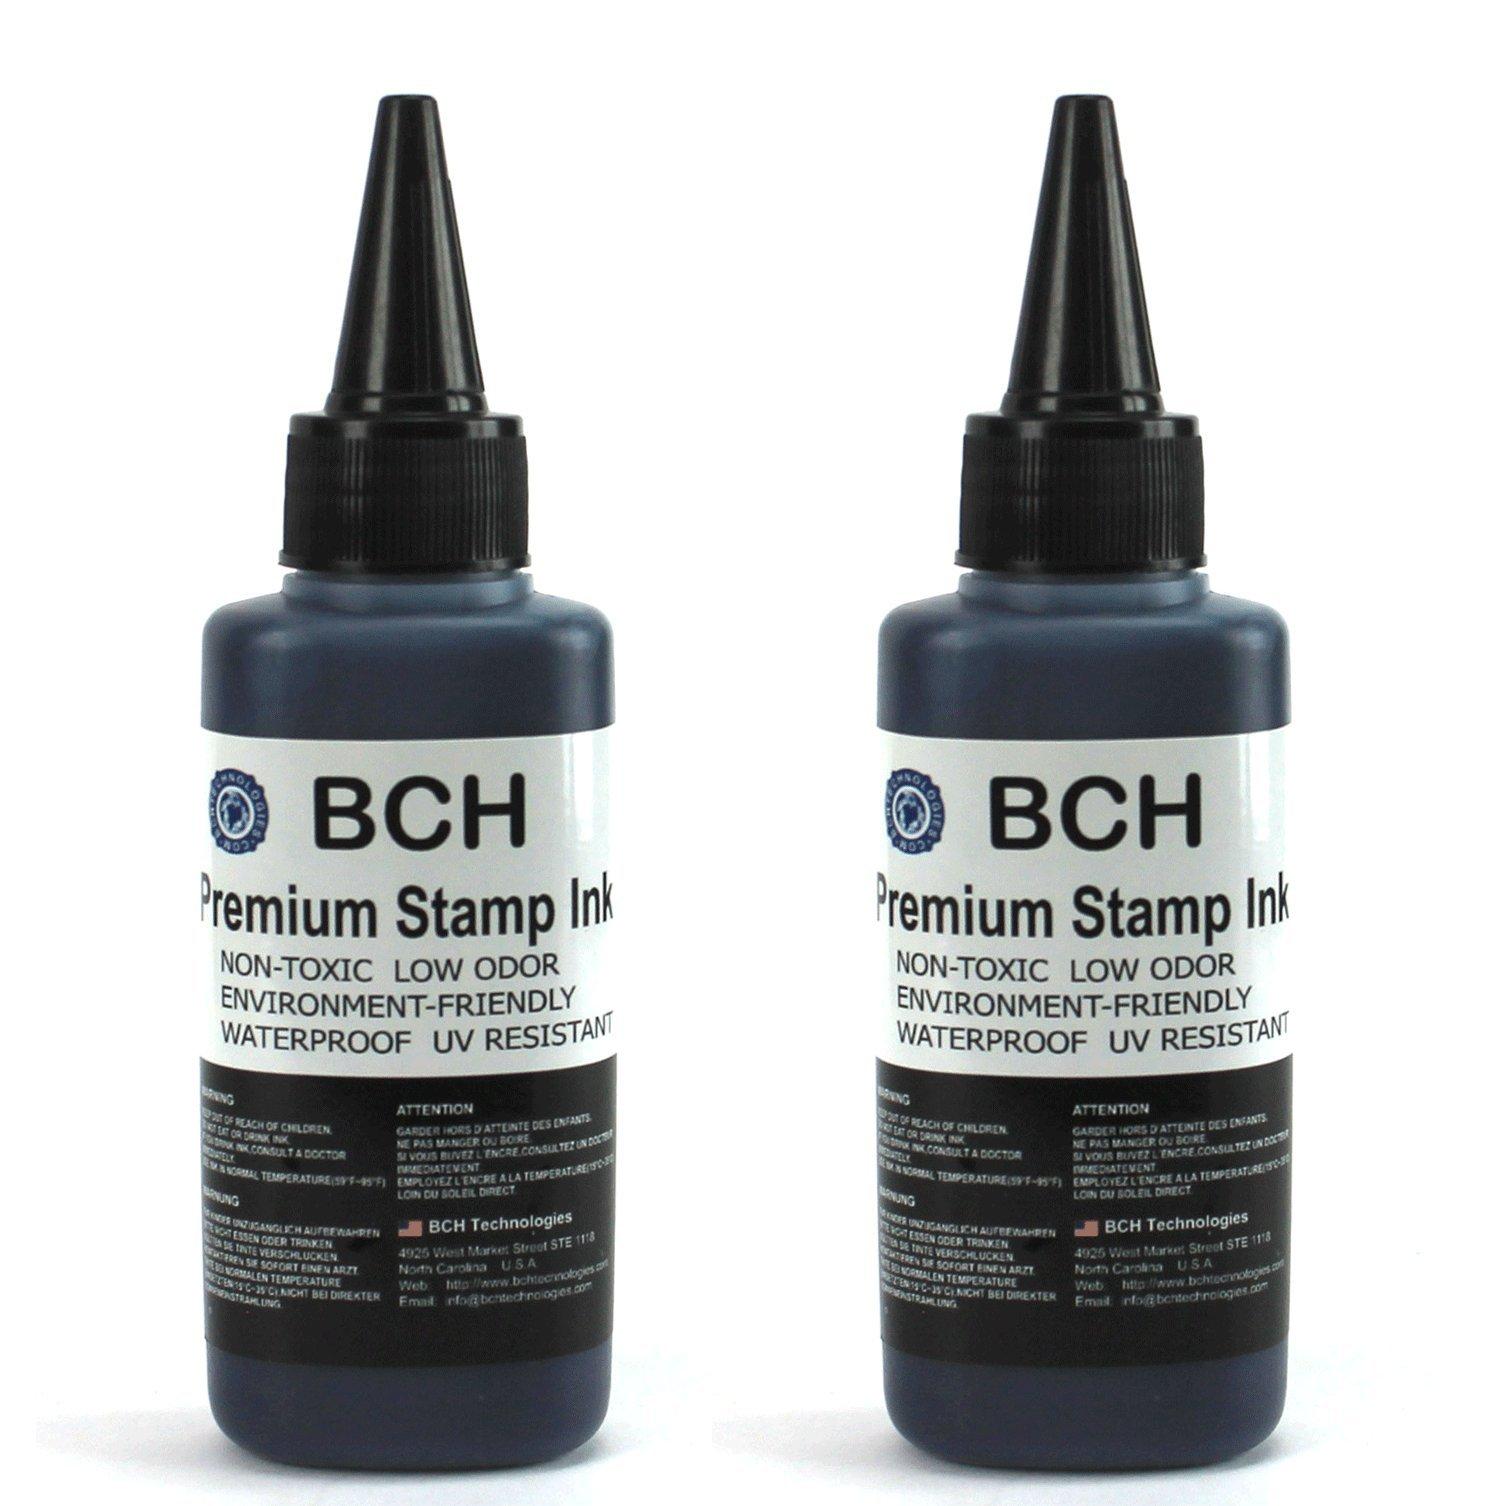 Bulk 2X Black Stamp Ink Refill by BCH - Premium Grade -2.5 oz (75 ml) Ink Per Bottle by BCH (Image #1)